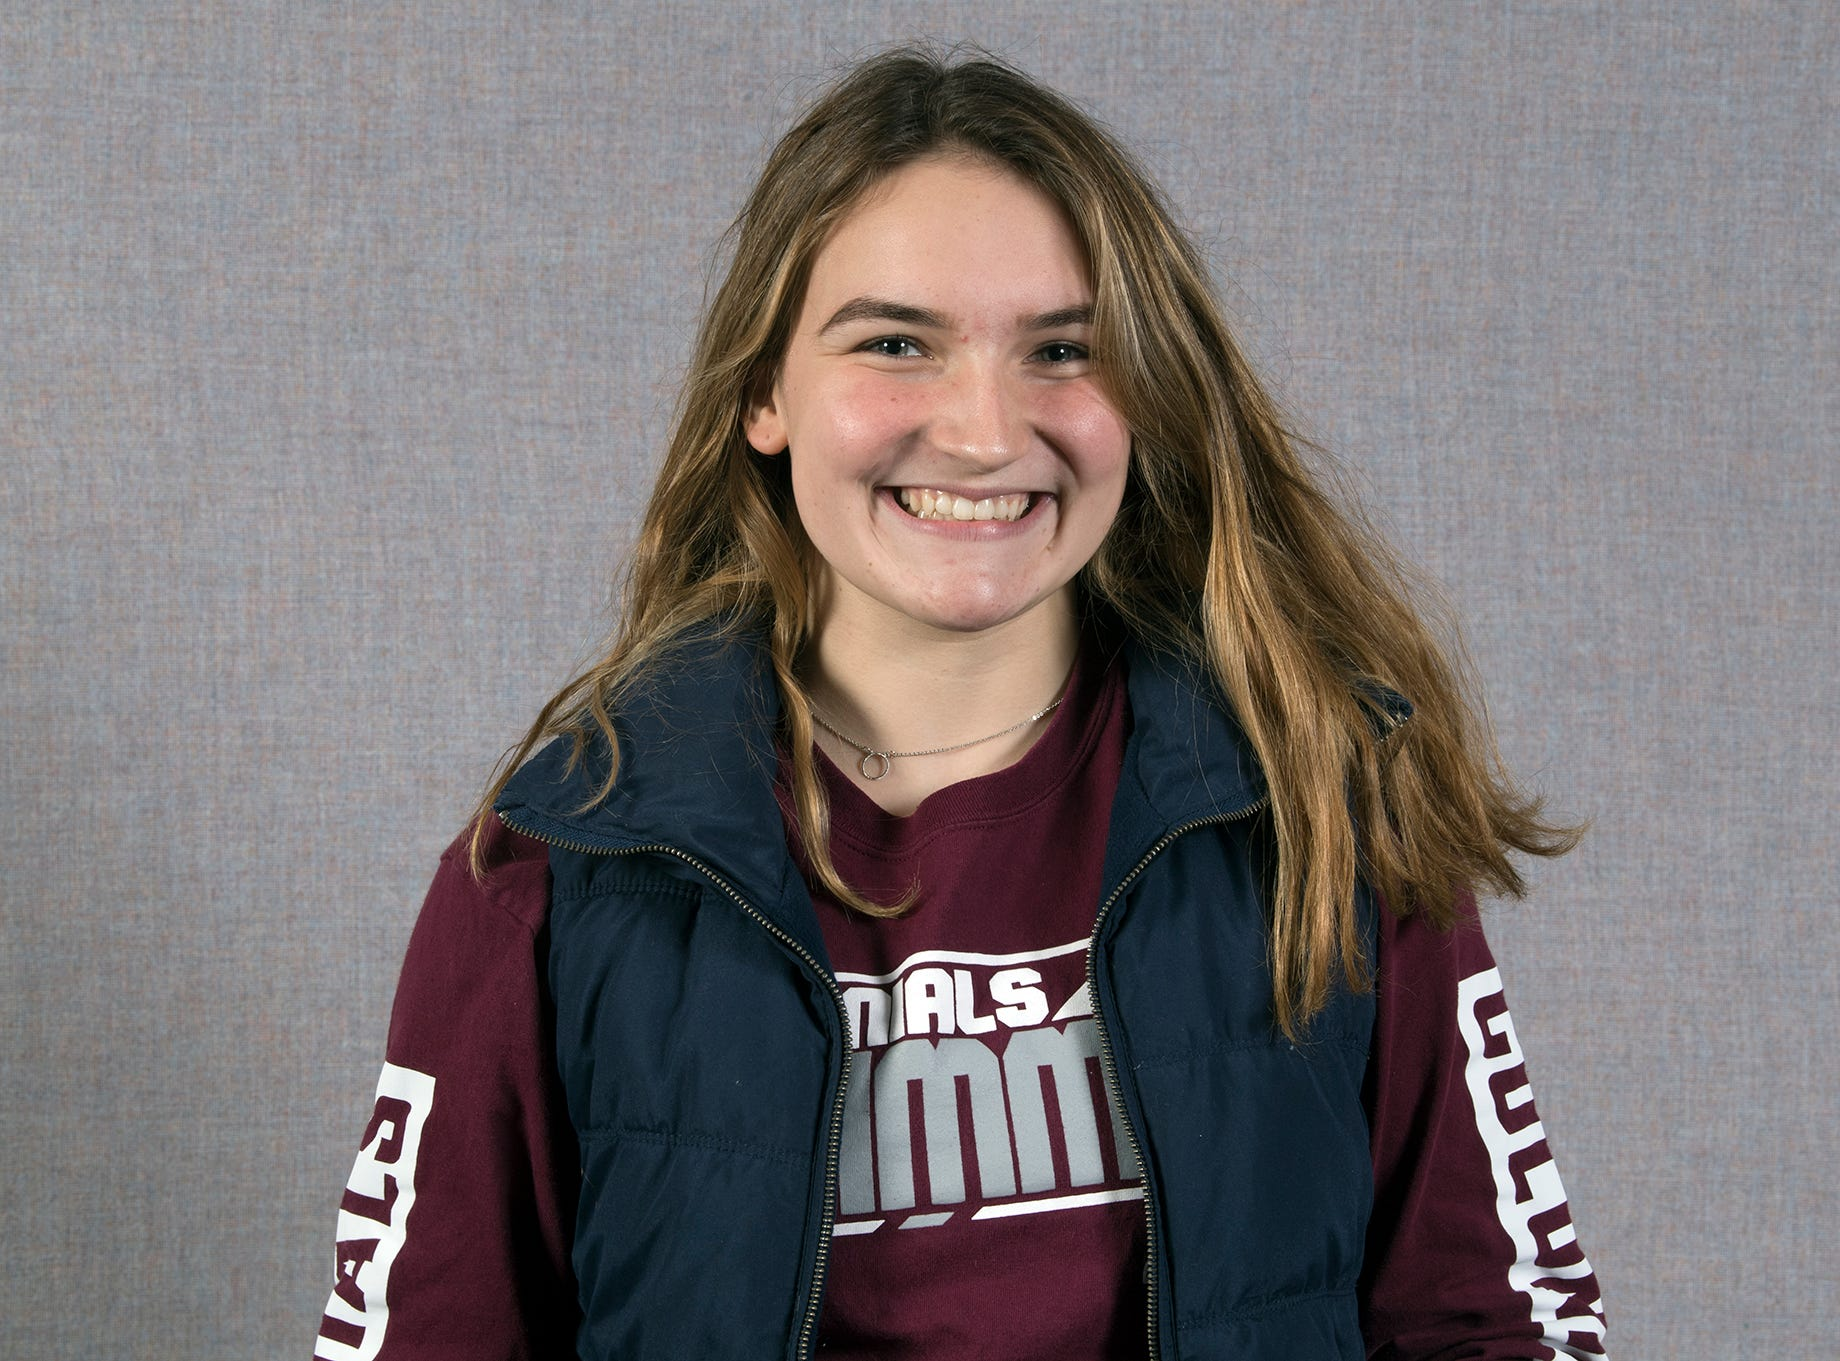 Lauren Richter, New Oxford Swim Team, during the 2018-19 GameTimePa YAIAA Winter Media Day Sunday November 11, 2018.